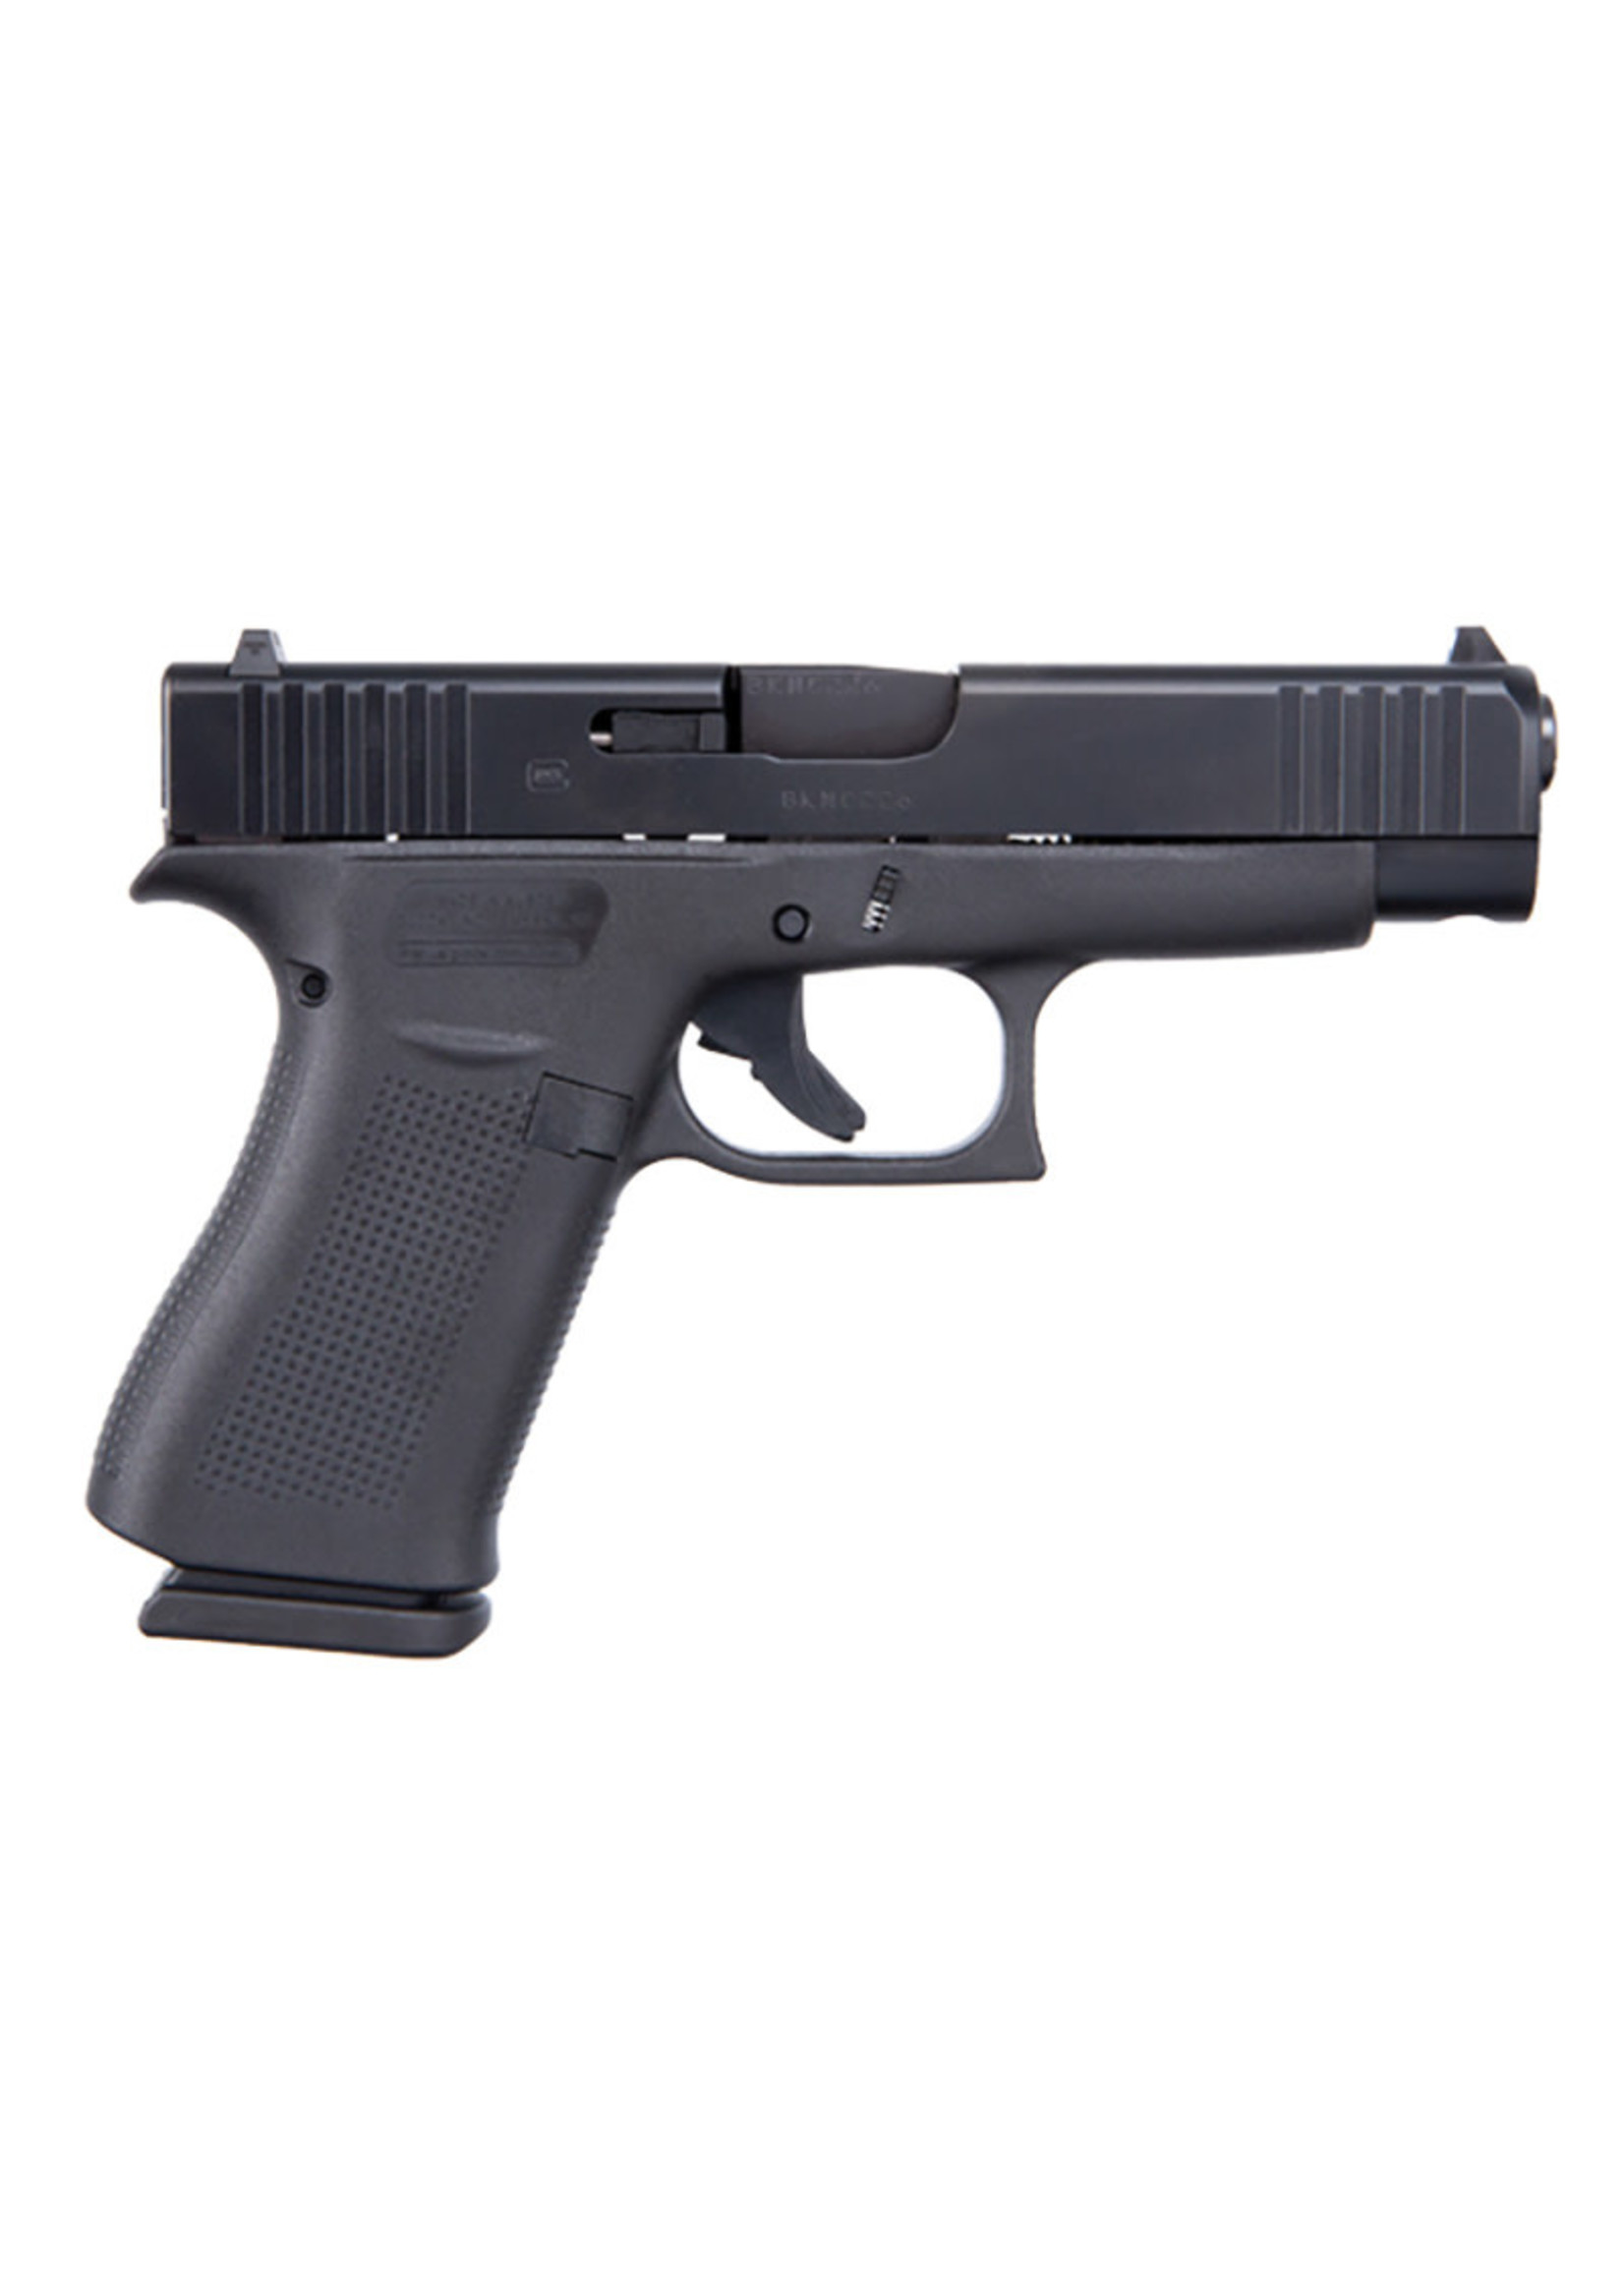 "Glock Glock 48 Pistol, 9mm, 4.17"" Barrel, Fixed Sights, Black, 10-rd"